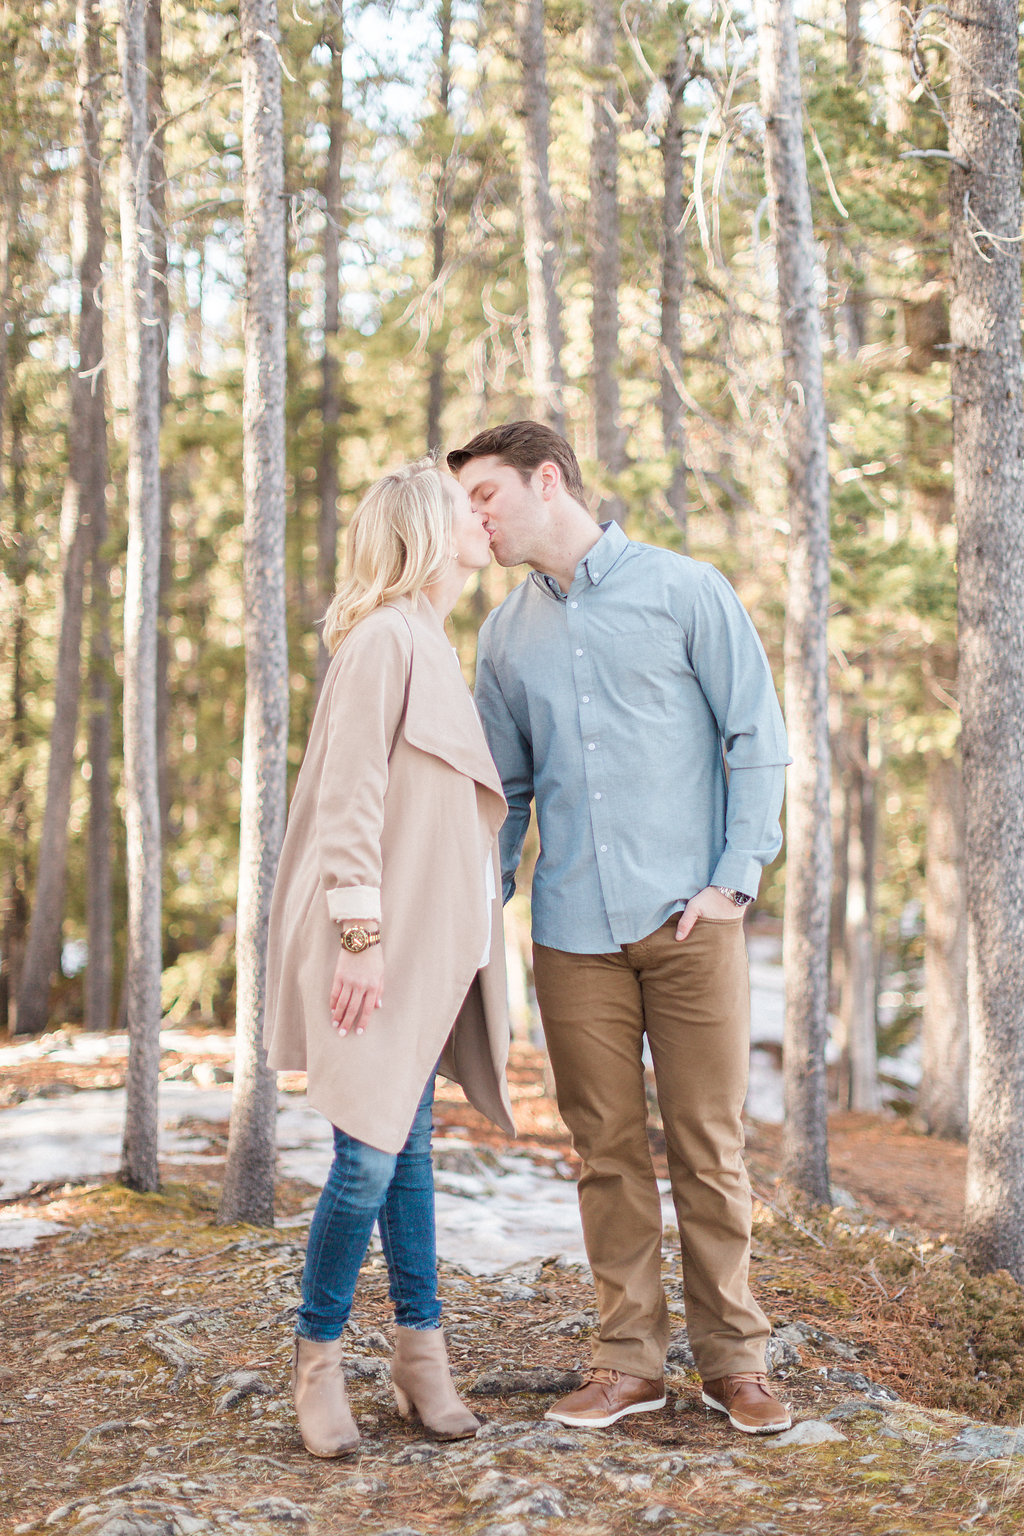 Mountain Engagement | Heidrich Photography | Banff Wedding Photographer | Joy Wed blog | http://www.joywed.com/blog